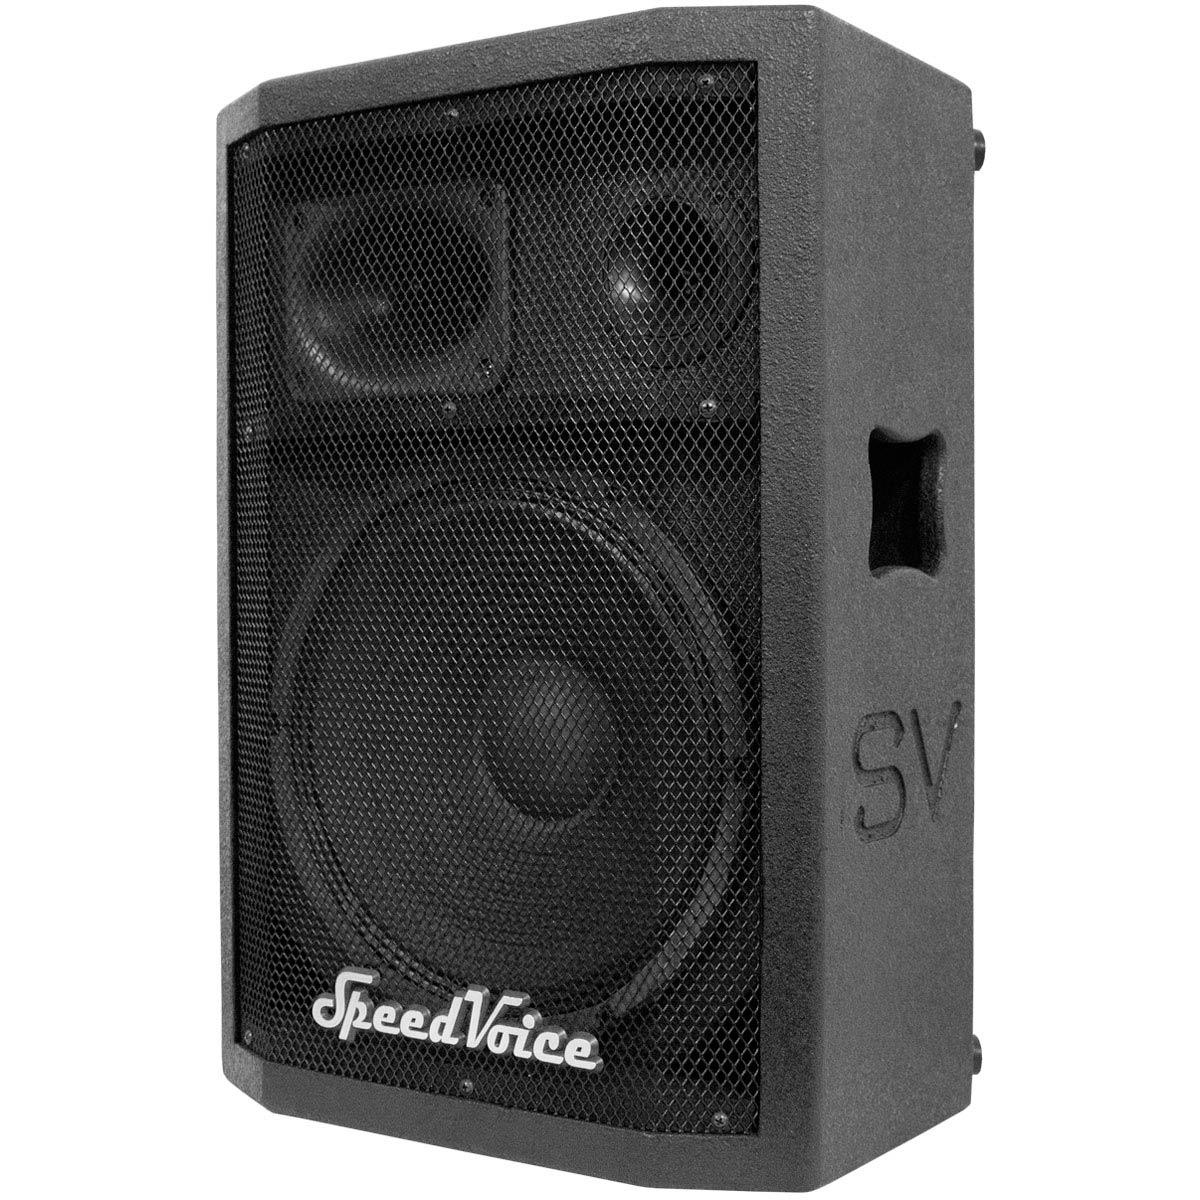 Caixa Passiva Fal 10 Pol 100W - SVX 10 Speed Voice